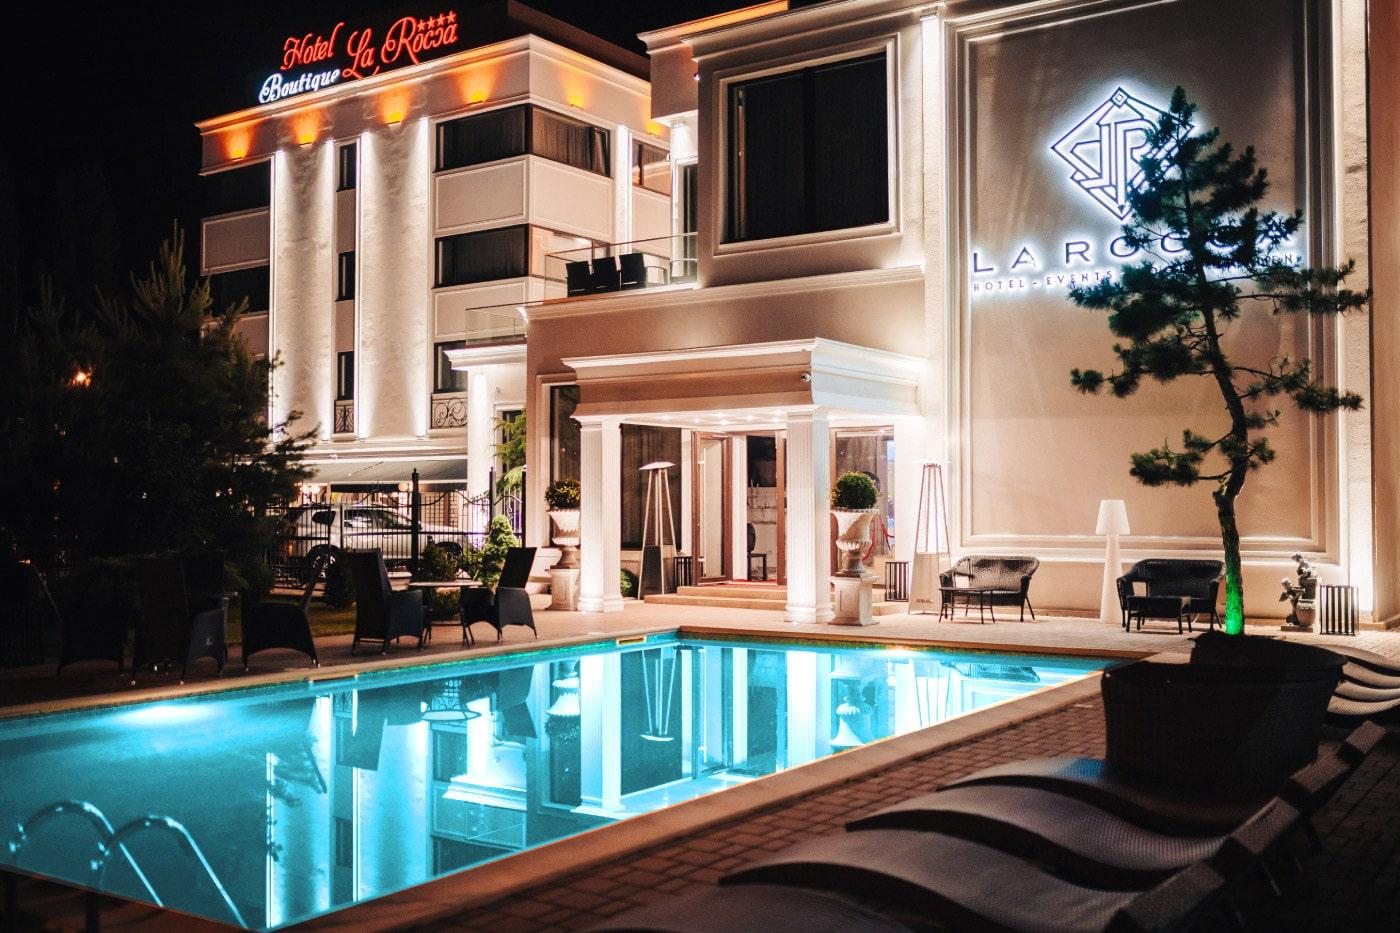 La Rocca Hotel Boutique – Events – Pool & Garden - Piscina pe timp de seara